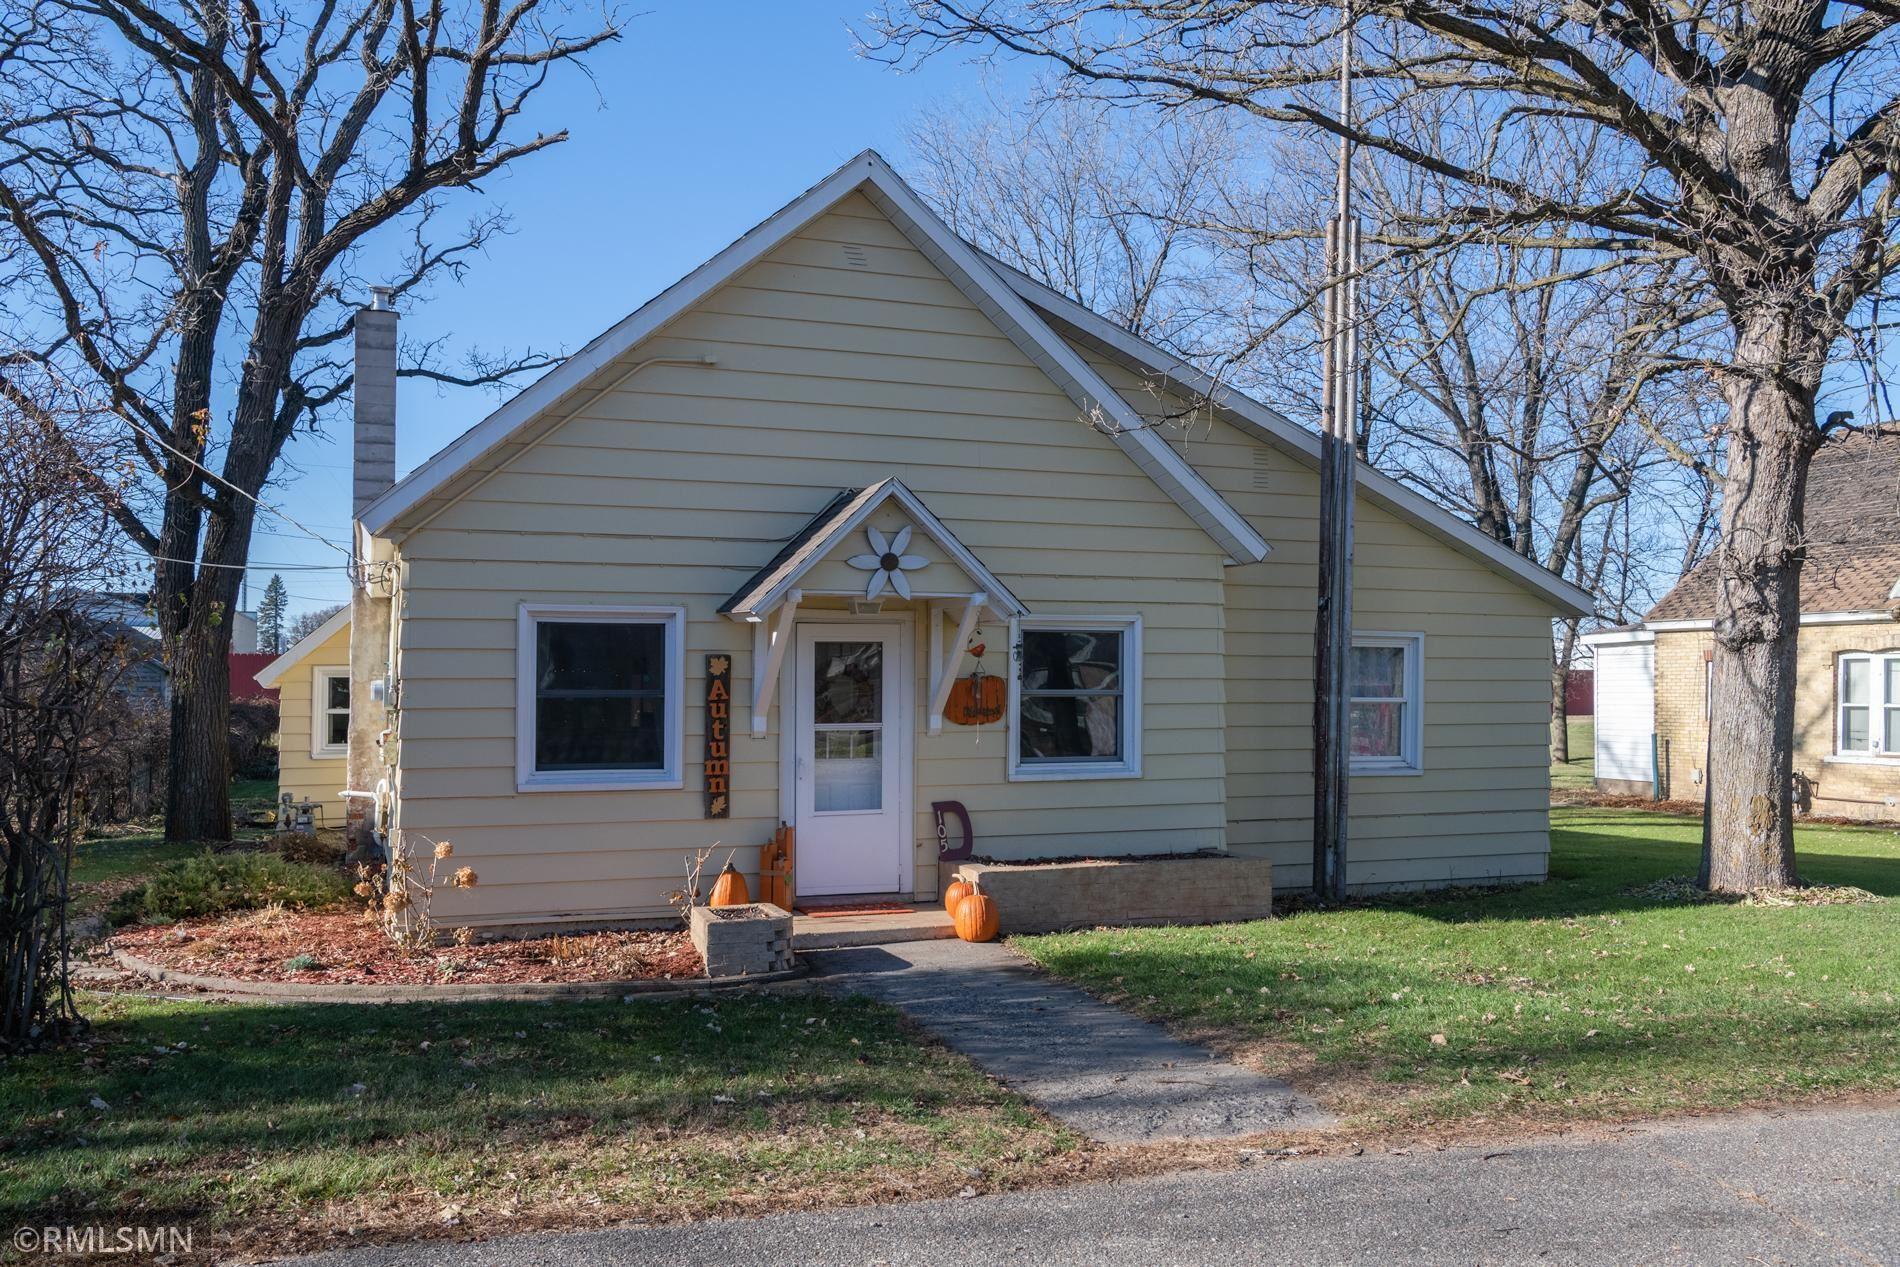 105 N Aspen Street, Royalton, MN 56373 - MLS#: 5682485